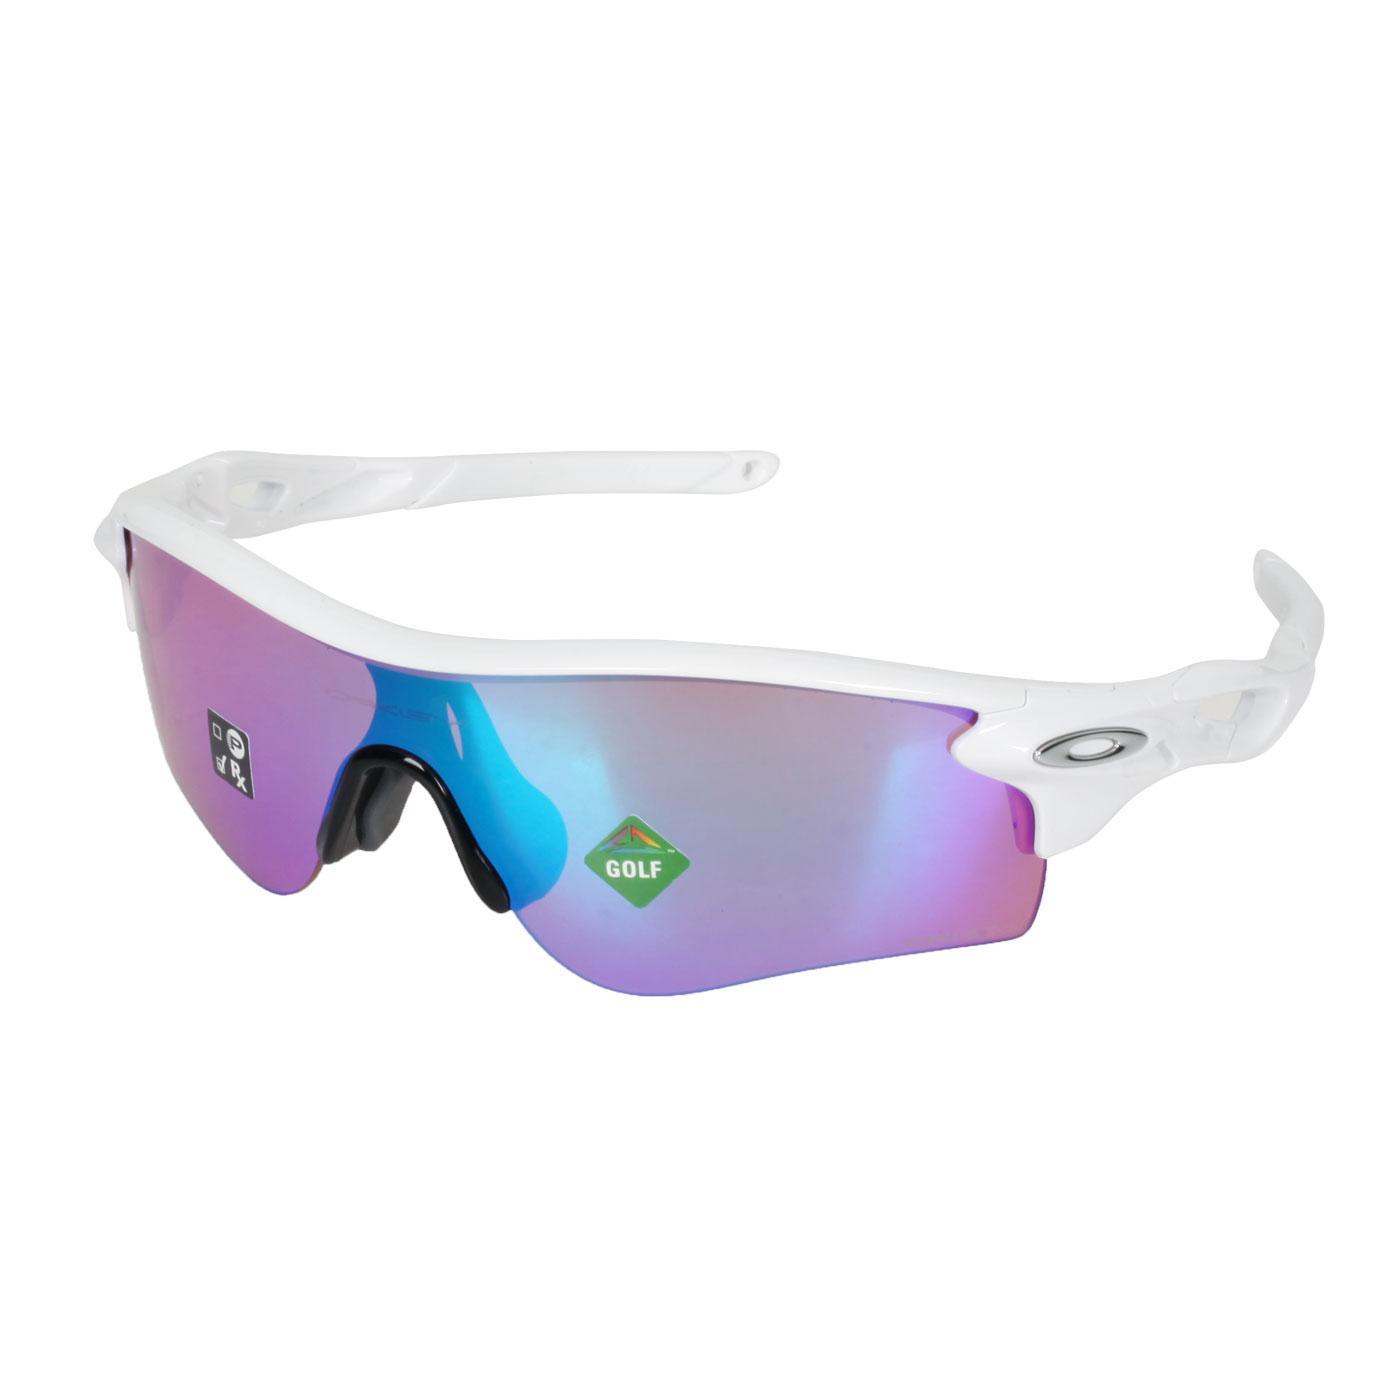 OAKLEY RADARLOCK PATH(A) 一般太陽眼鏡(附硬盒鼻墊) OAK-OO9206-6738 - 白銀